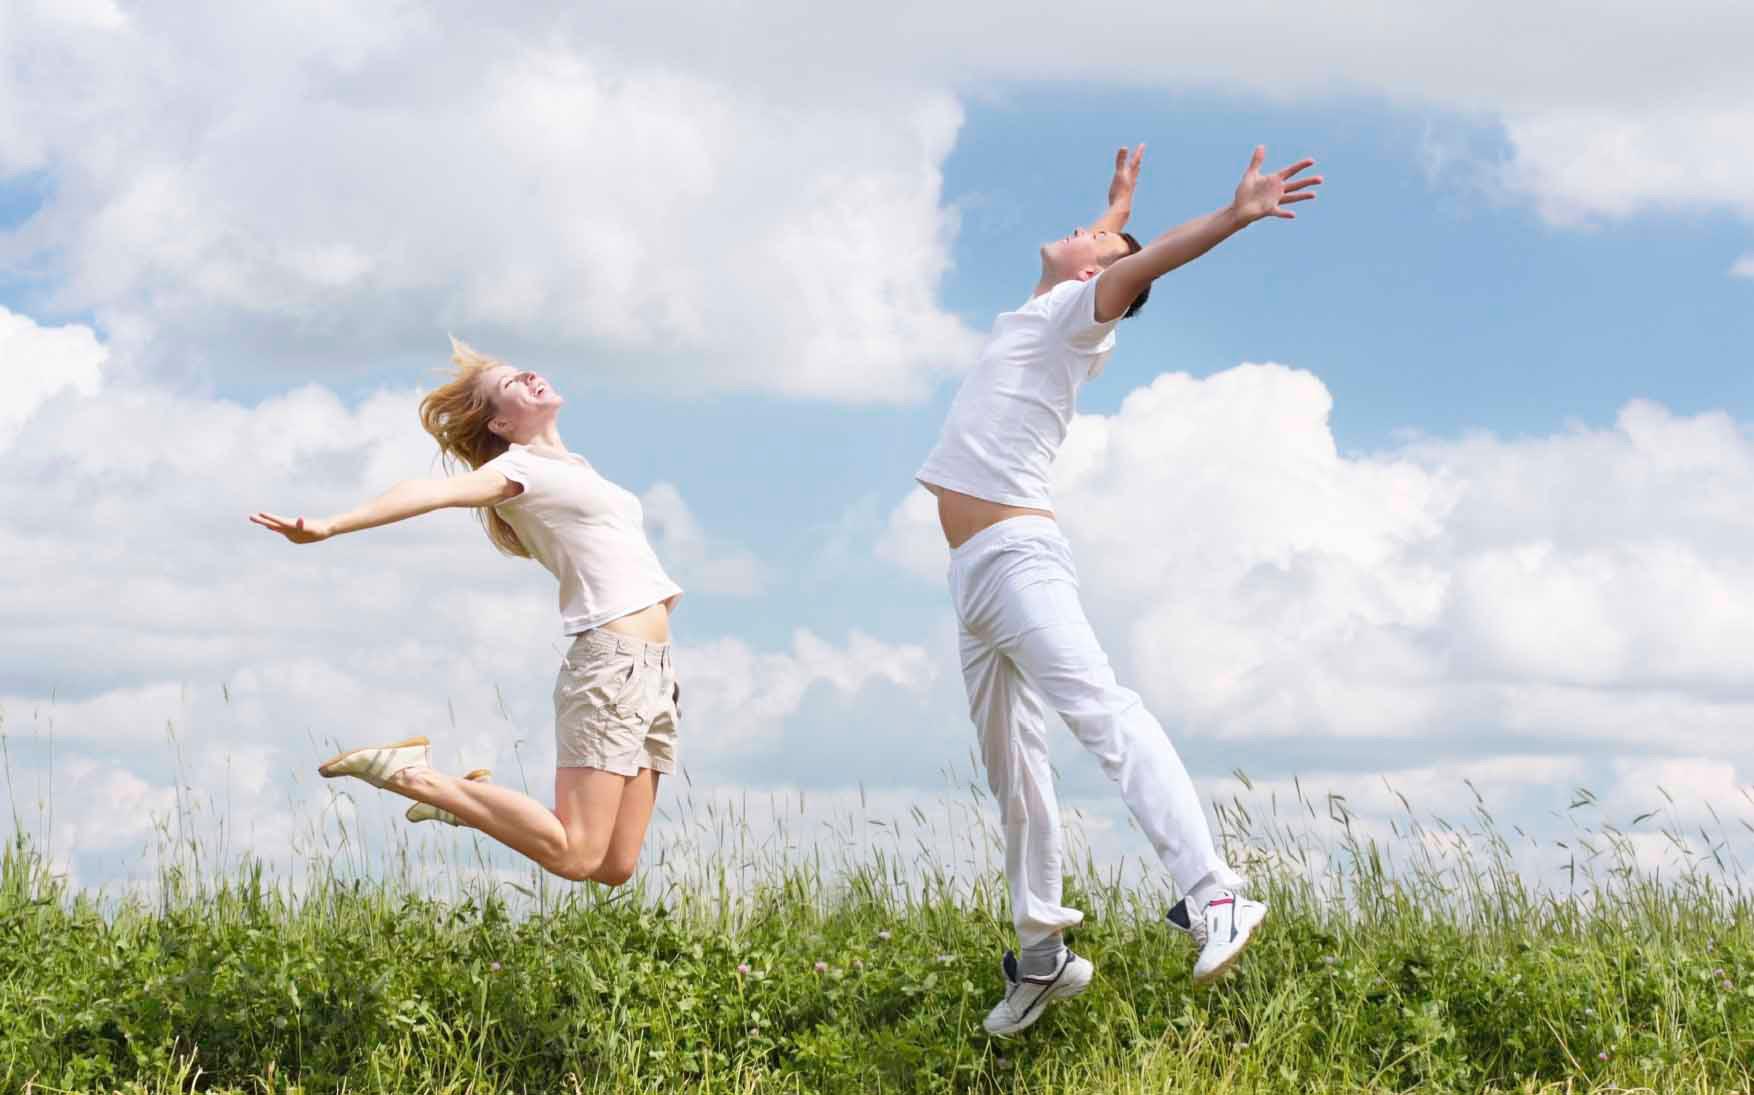 петросян картинки радость дыхания мужчин становились друг